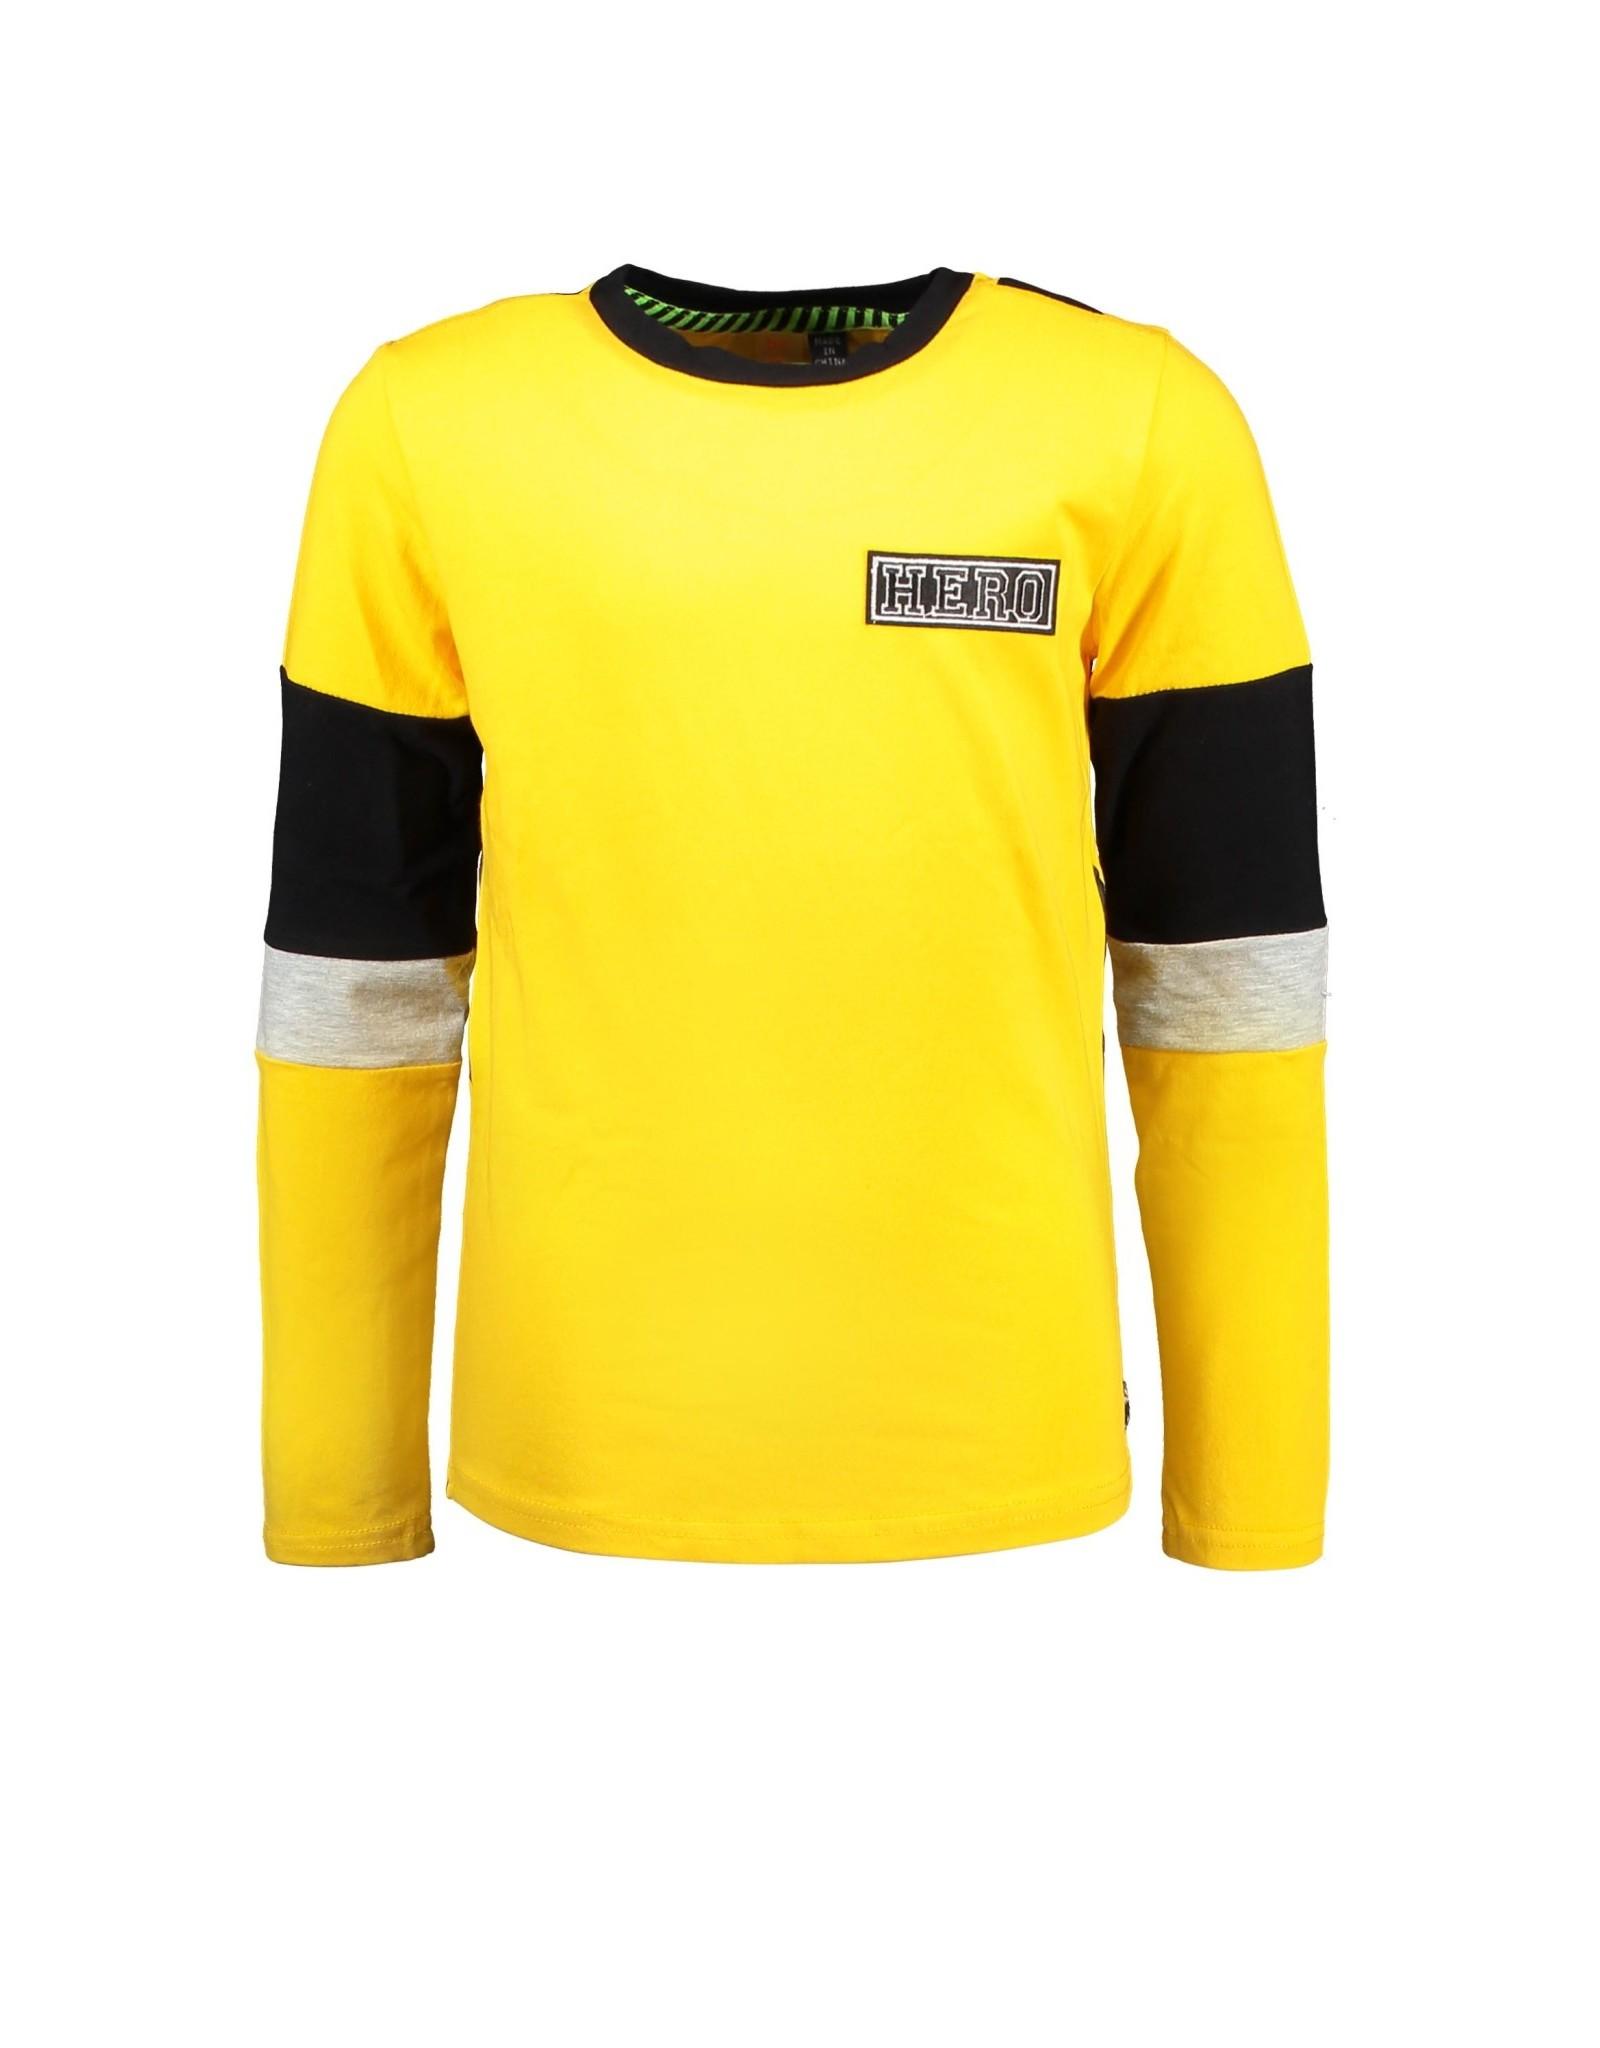 B-nosy Boys t-shirt with slanted striped backside 555 Lemon chrome